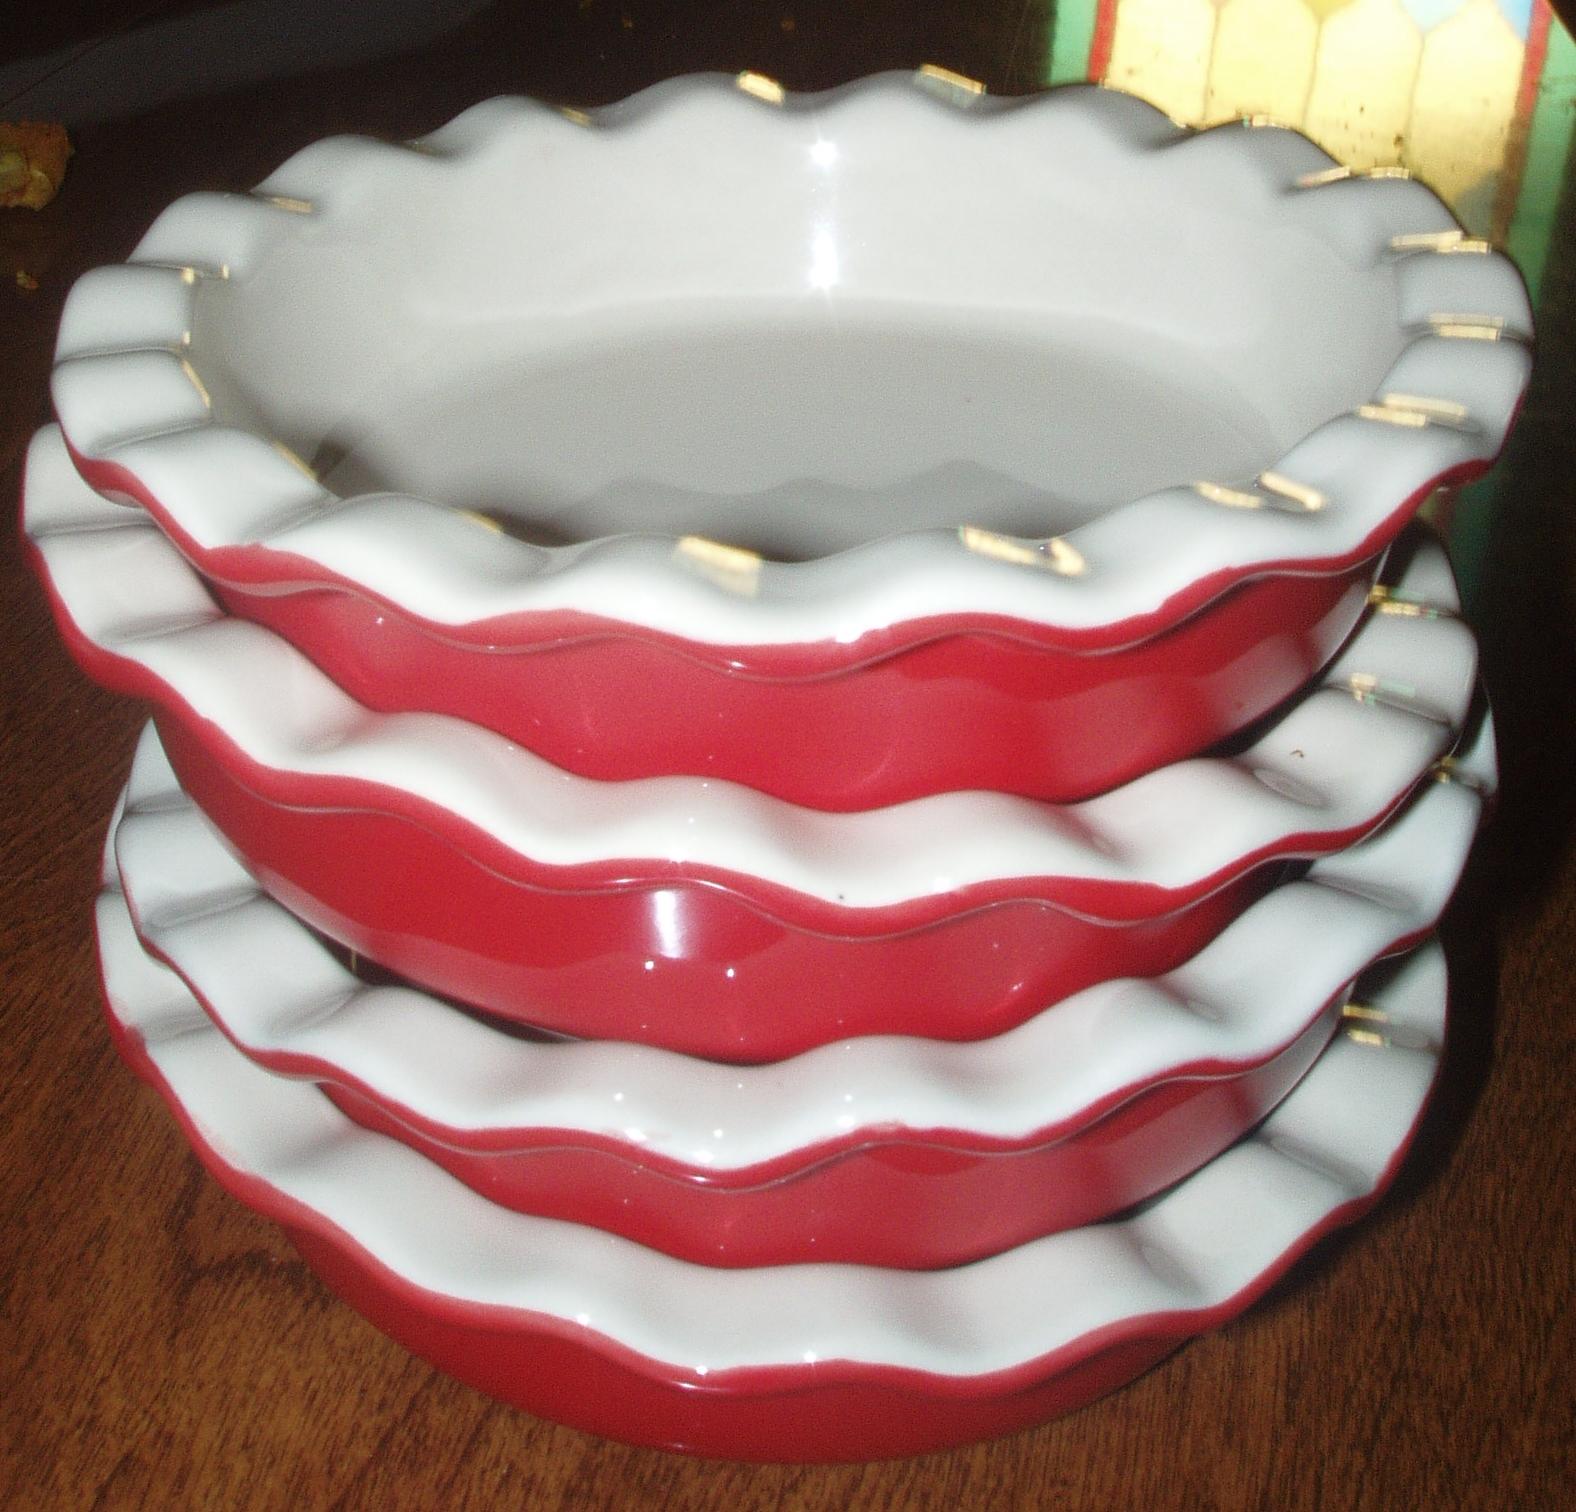 & Wayward Girlsu0027 Crafts: Making inidual mini pie crusts